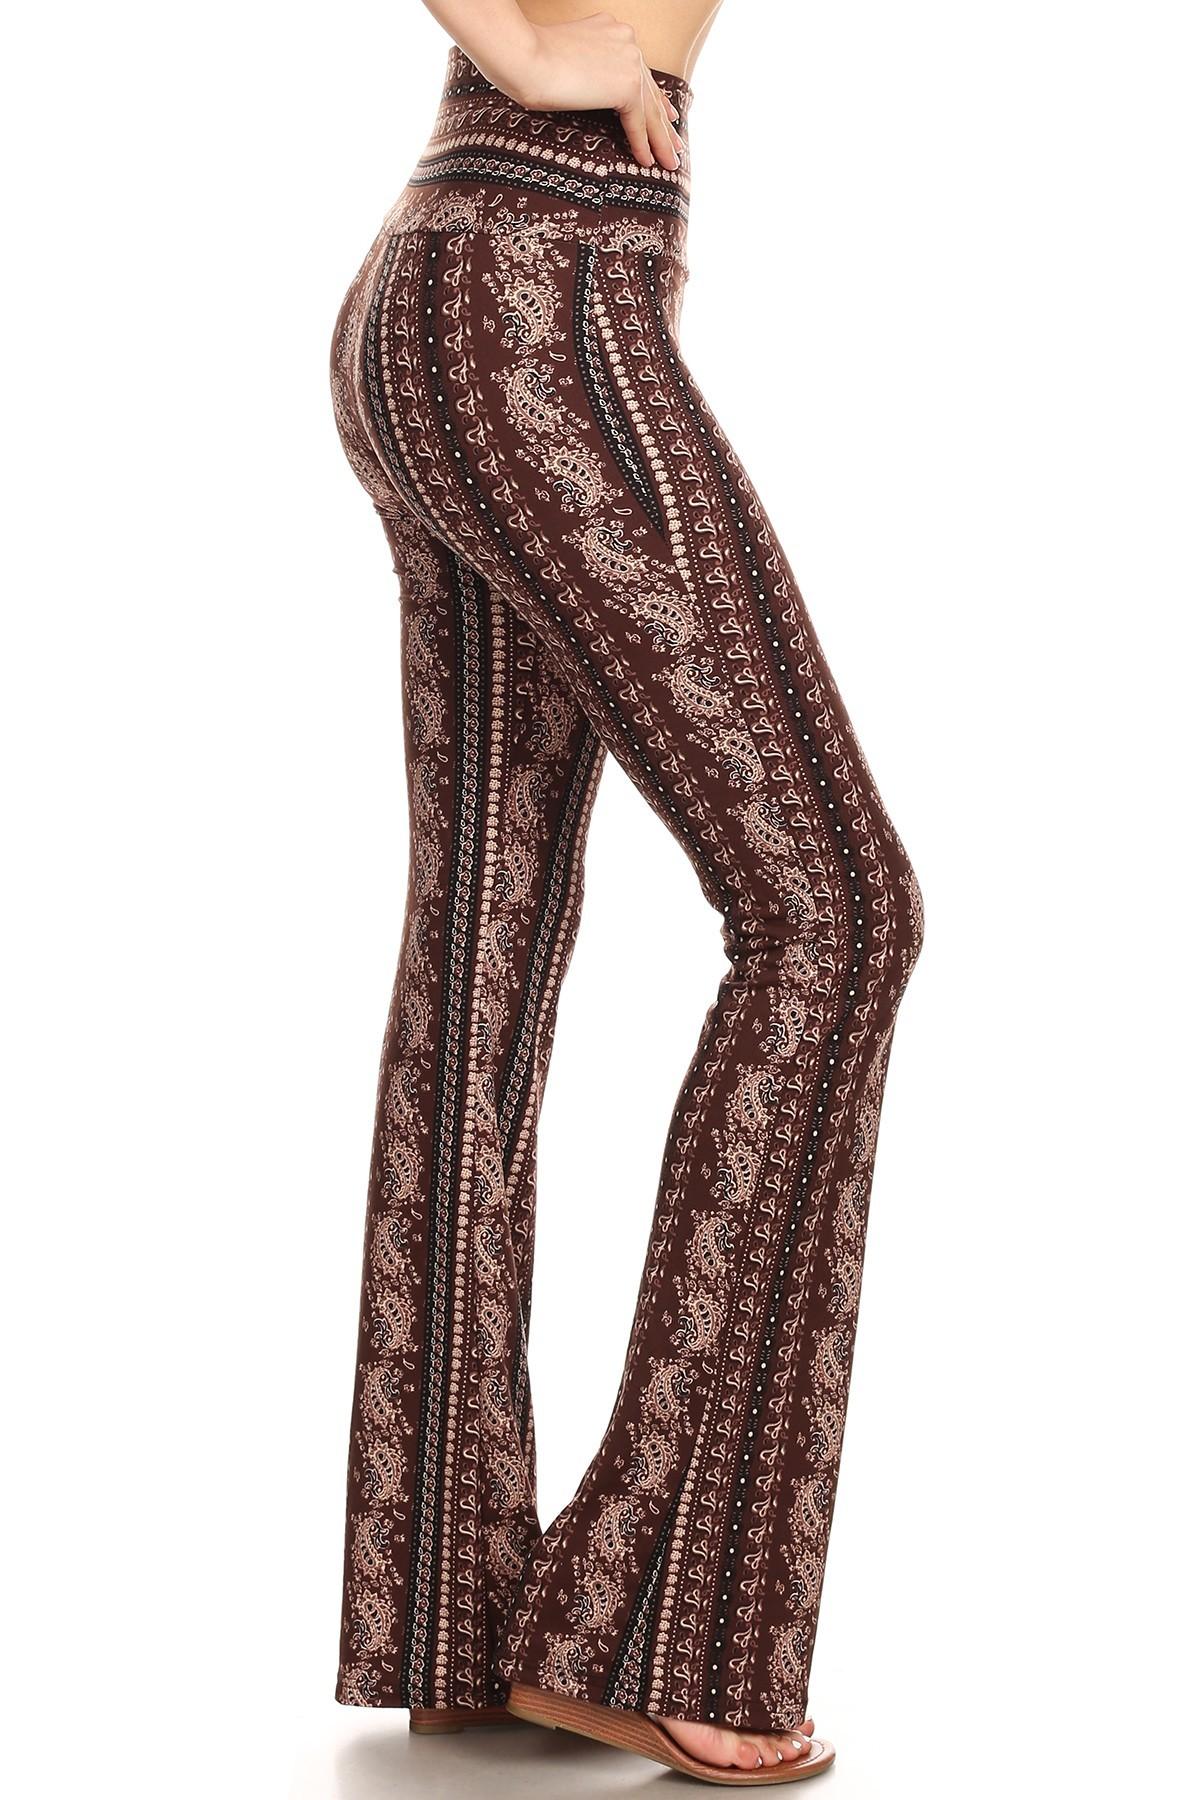 BROWN/TAN PAISLEY PRINT HIGH WAIST BRUSH POLY FLARE PANTS#8FP06-10